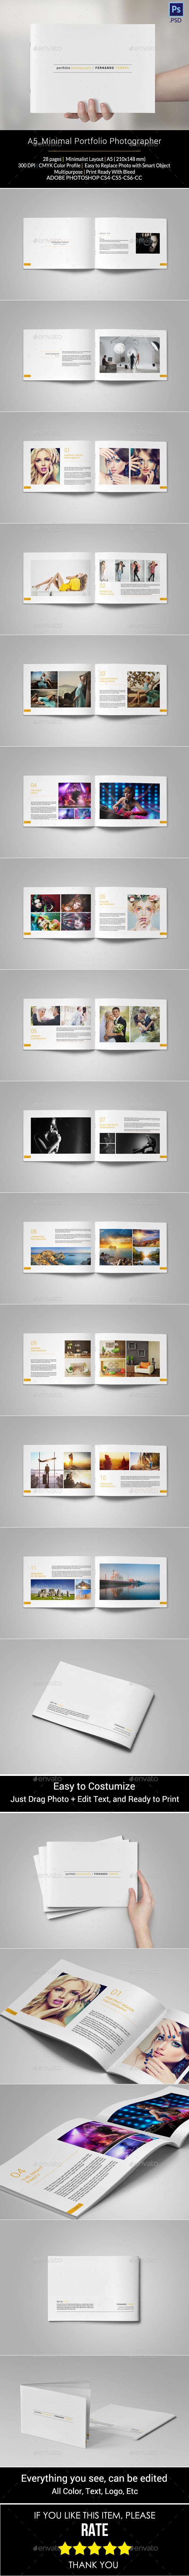 GraphicRiver A5 Minimal Portfolio 11063387